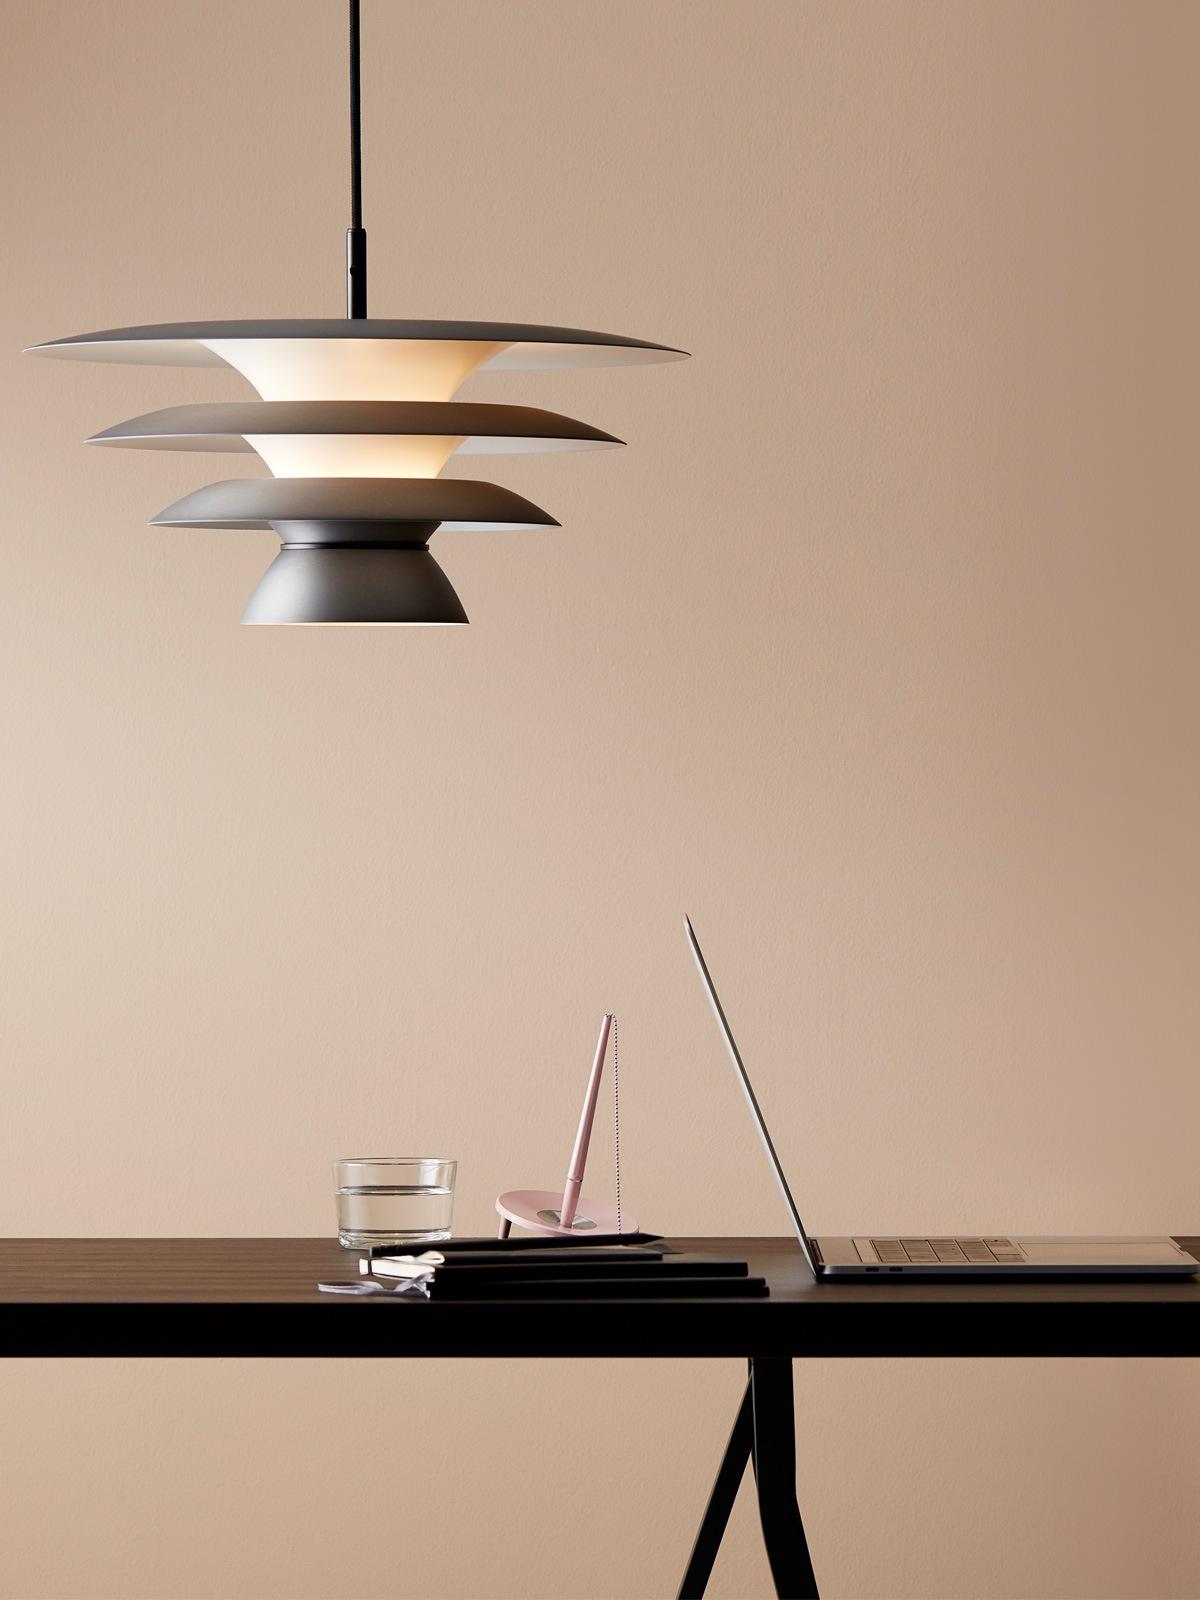 Da Vinci Pendelleuchte Belid Designort Berlin Lampen Onlineshop